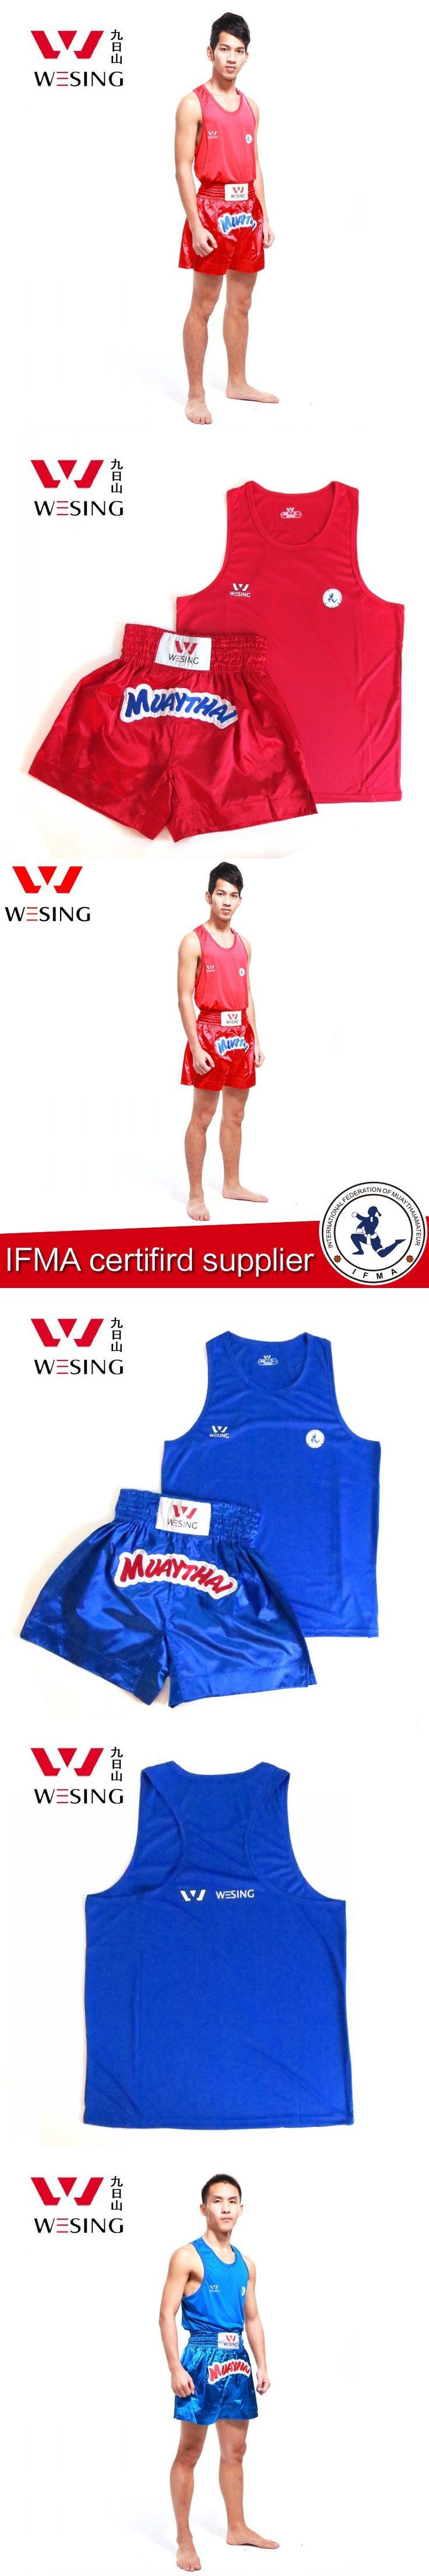 Freeshipping High Quality Muay Thai/kungfu Shorts Muay Thai Shirt Muay Thai Uniform Short Muay Thai